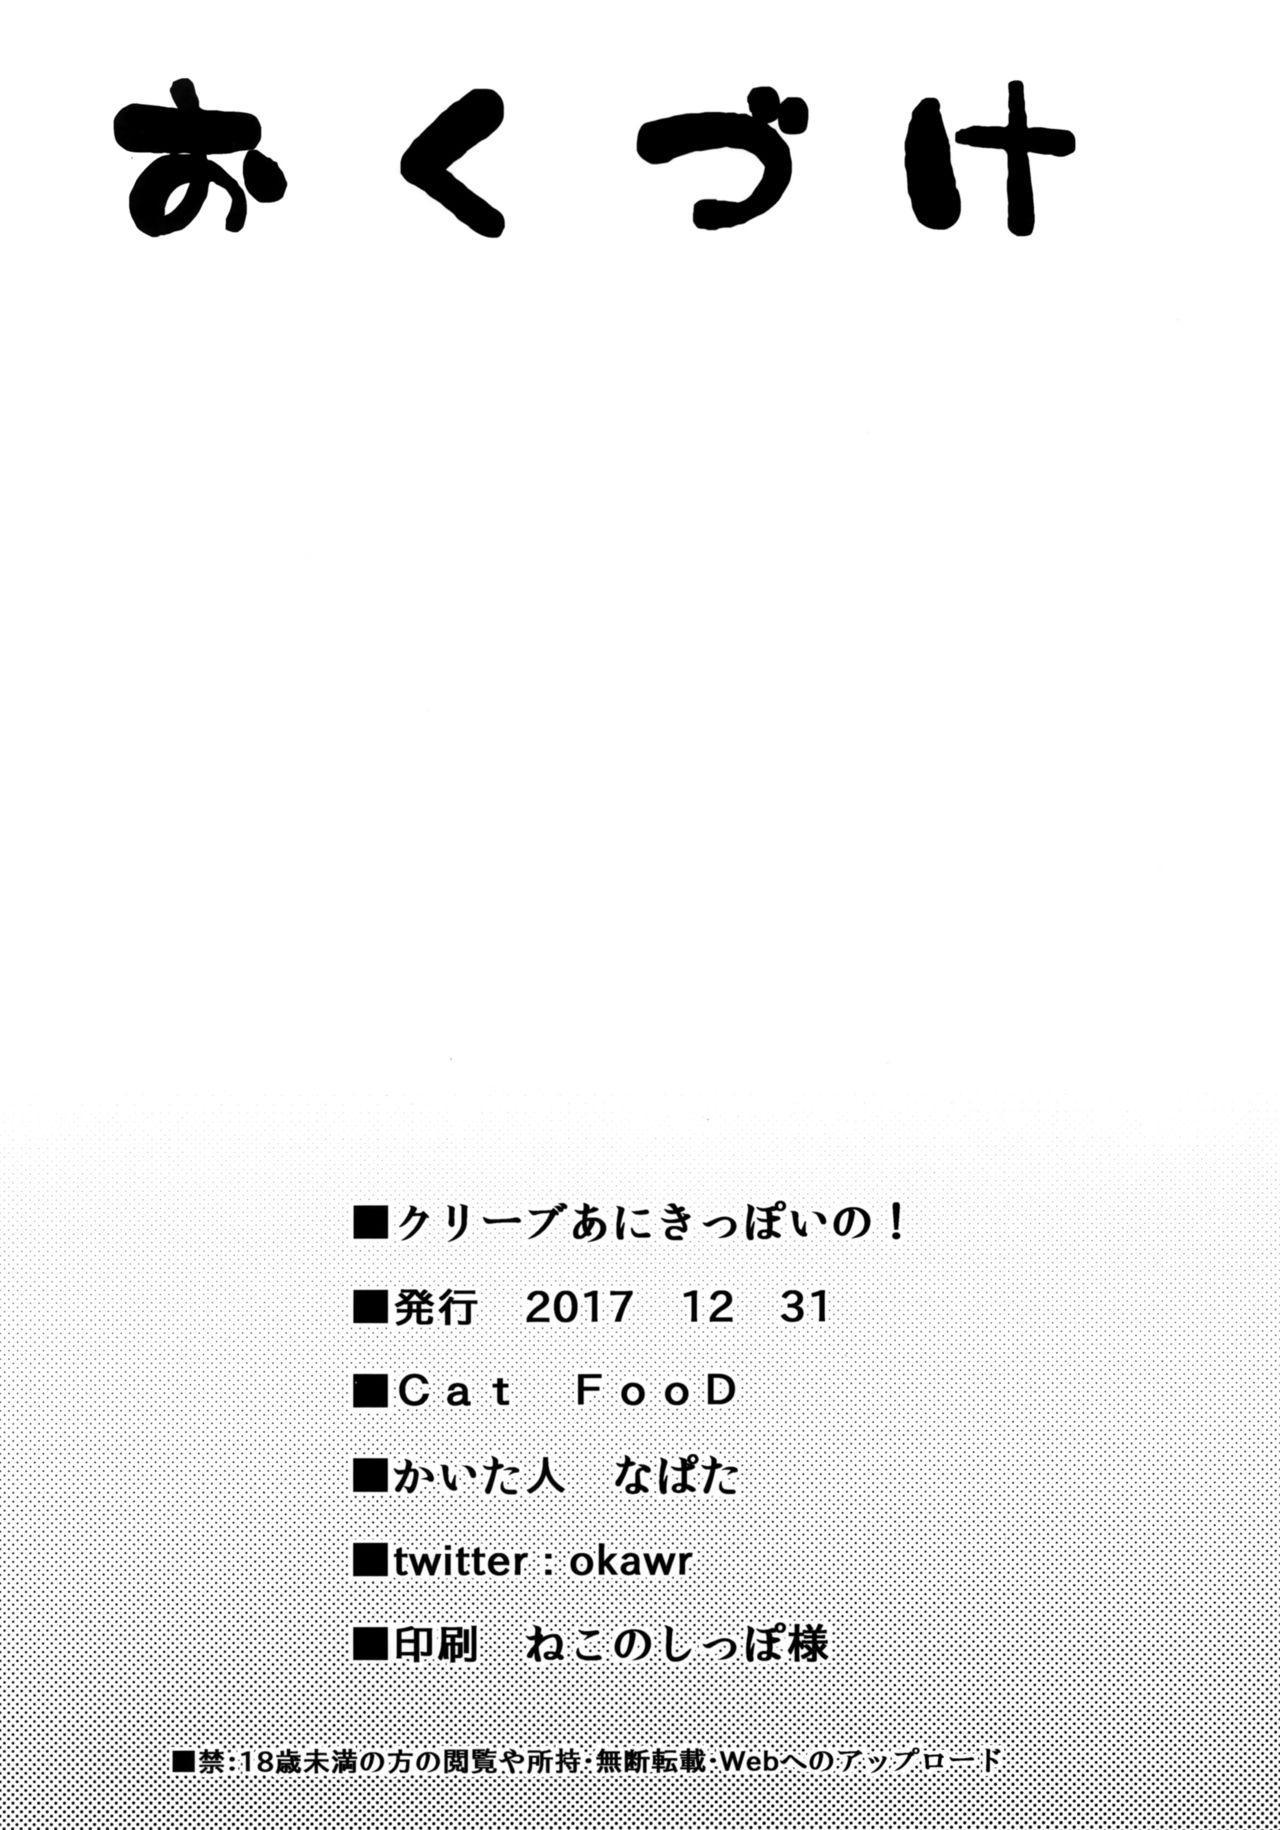 (C93) [Cat FooD (Napata)] Cleve-aniki-ppoi no! (Azur Lane) [Chinese] [无毒汉化组] 16